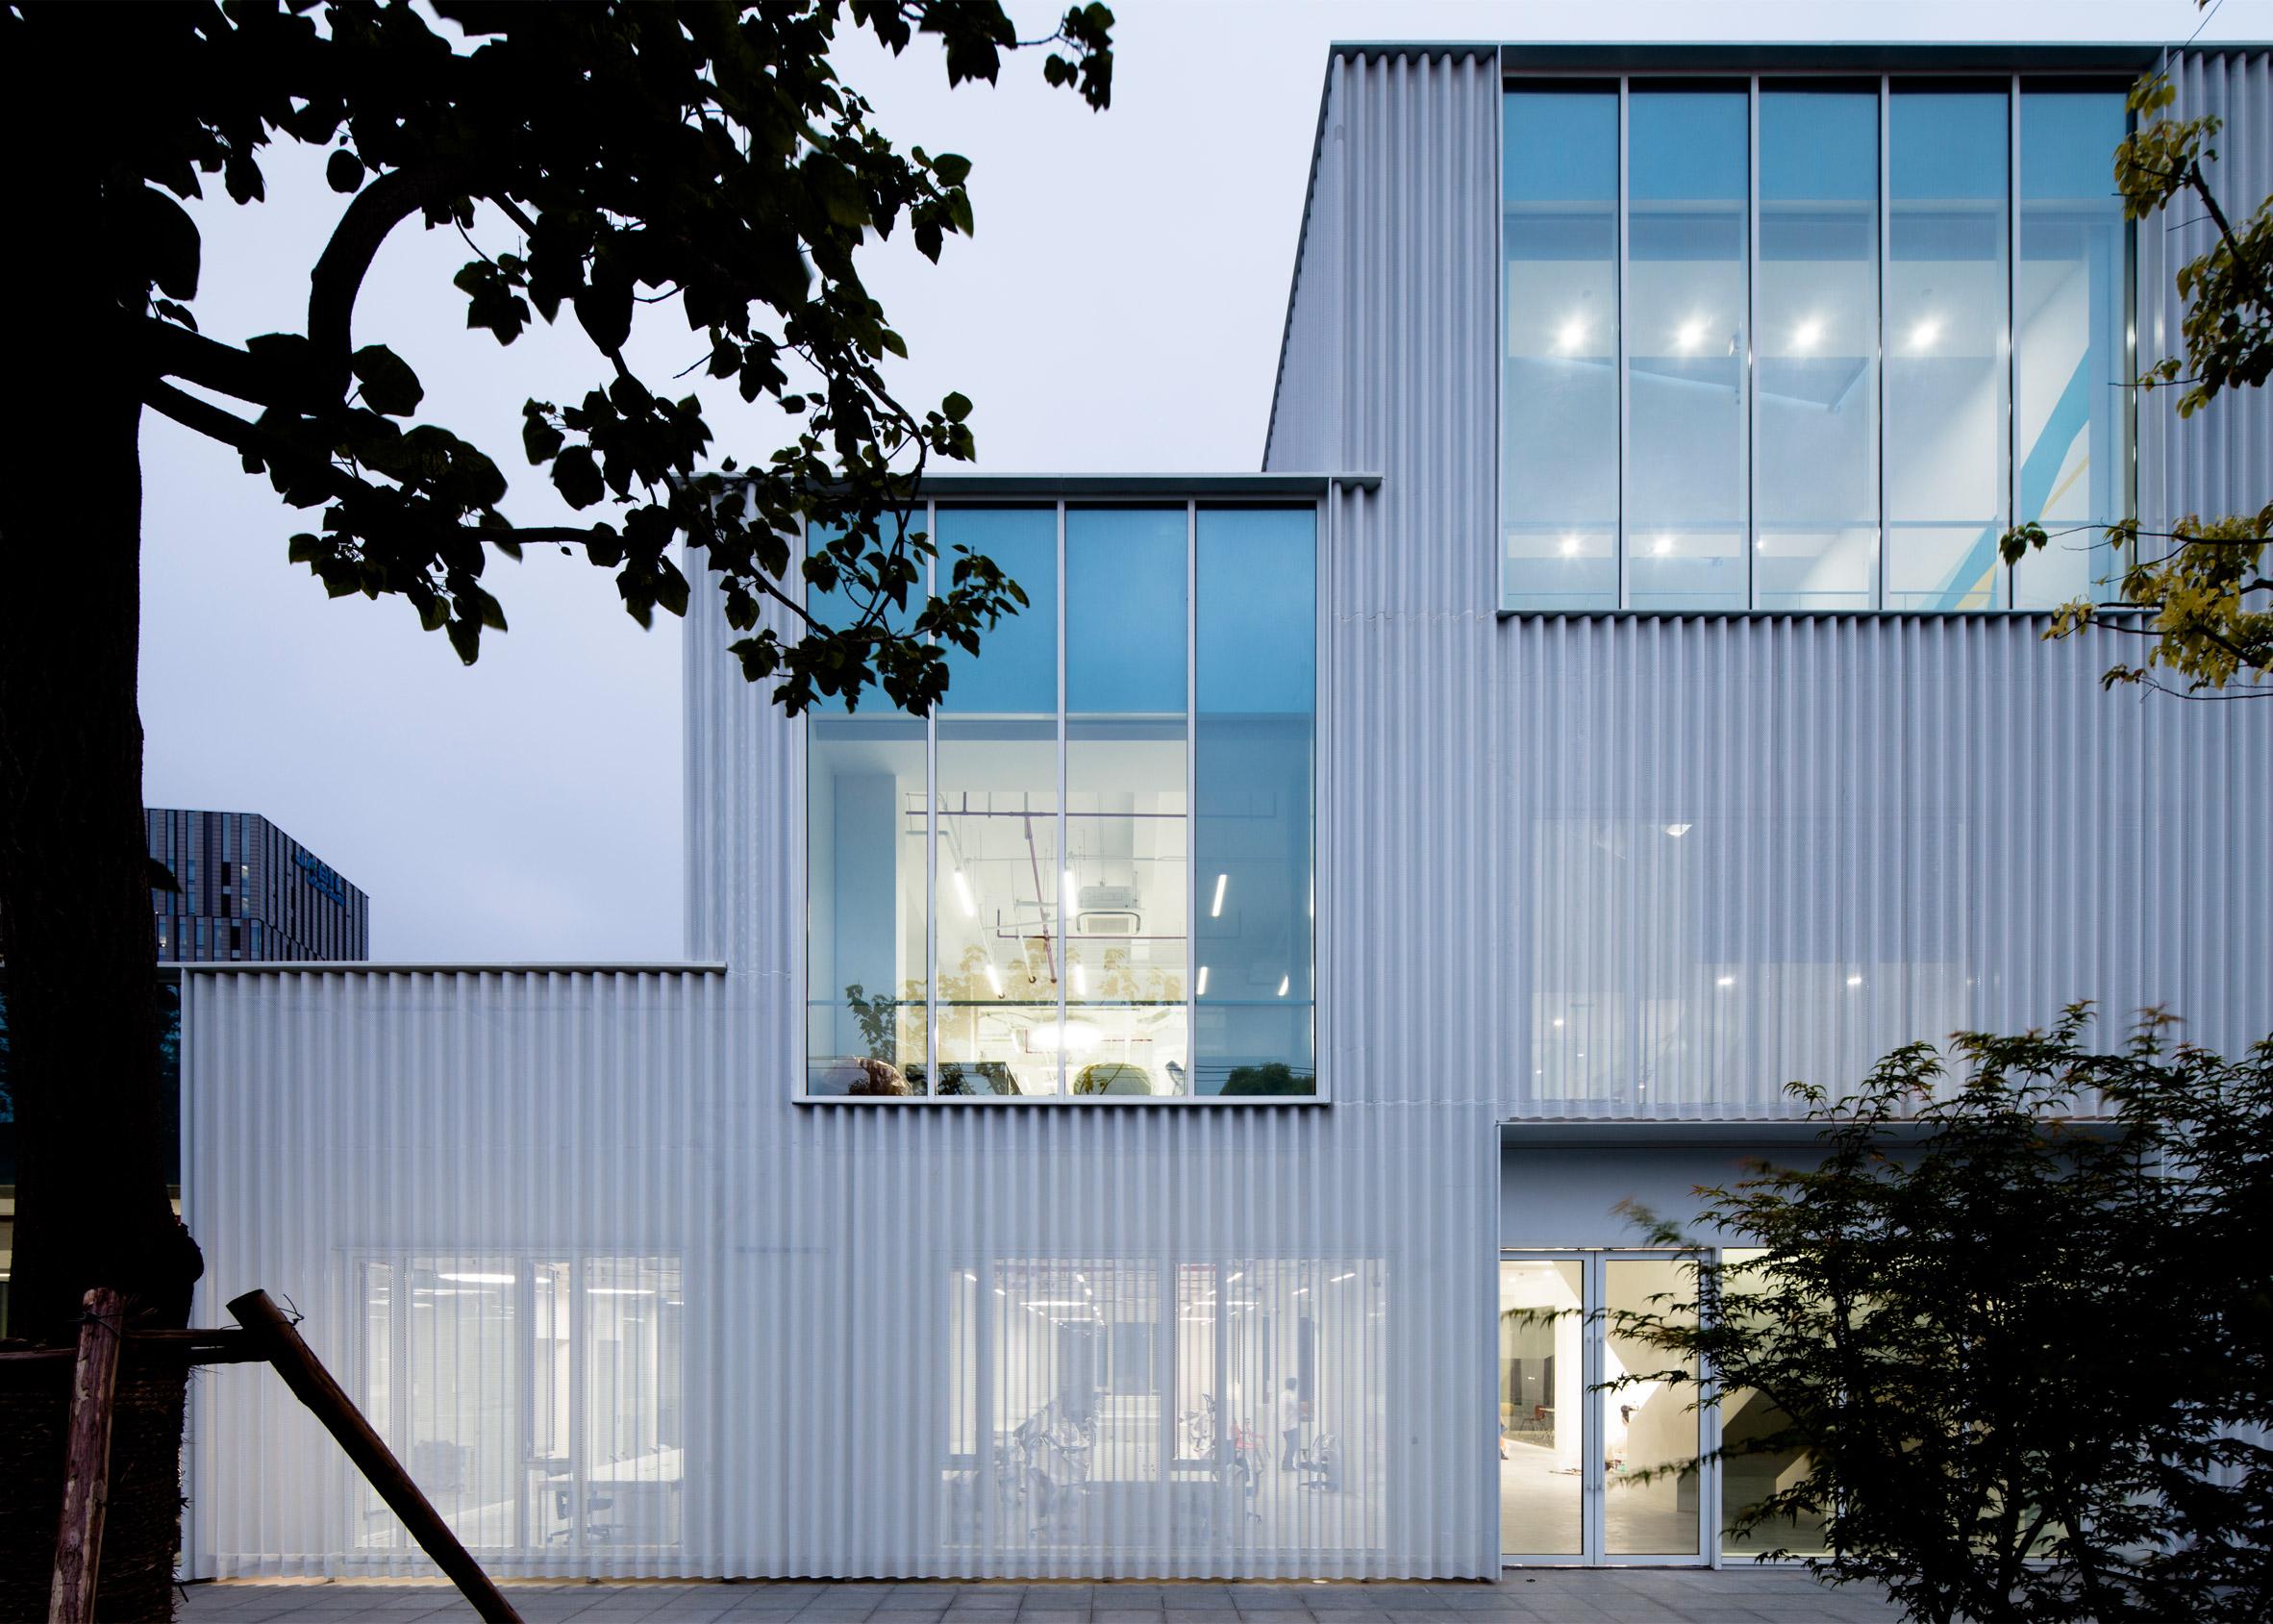 Shanghai office transformed into aluminium-clad tech incubator by Schmidt Hammer Lassen